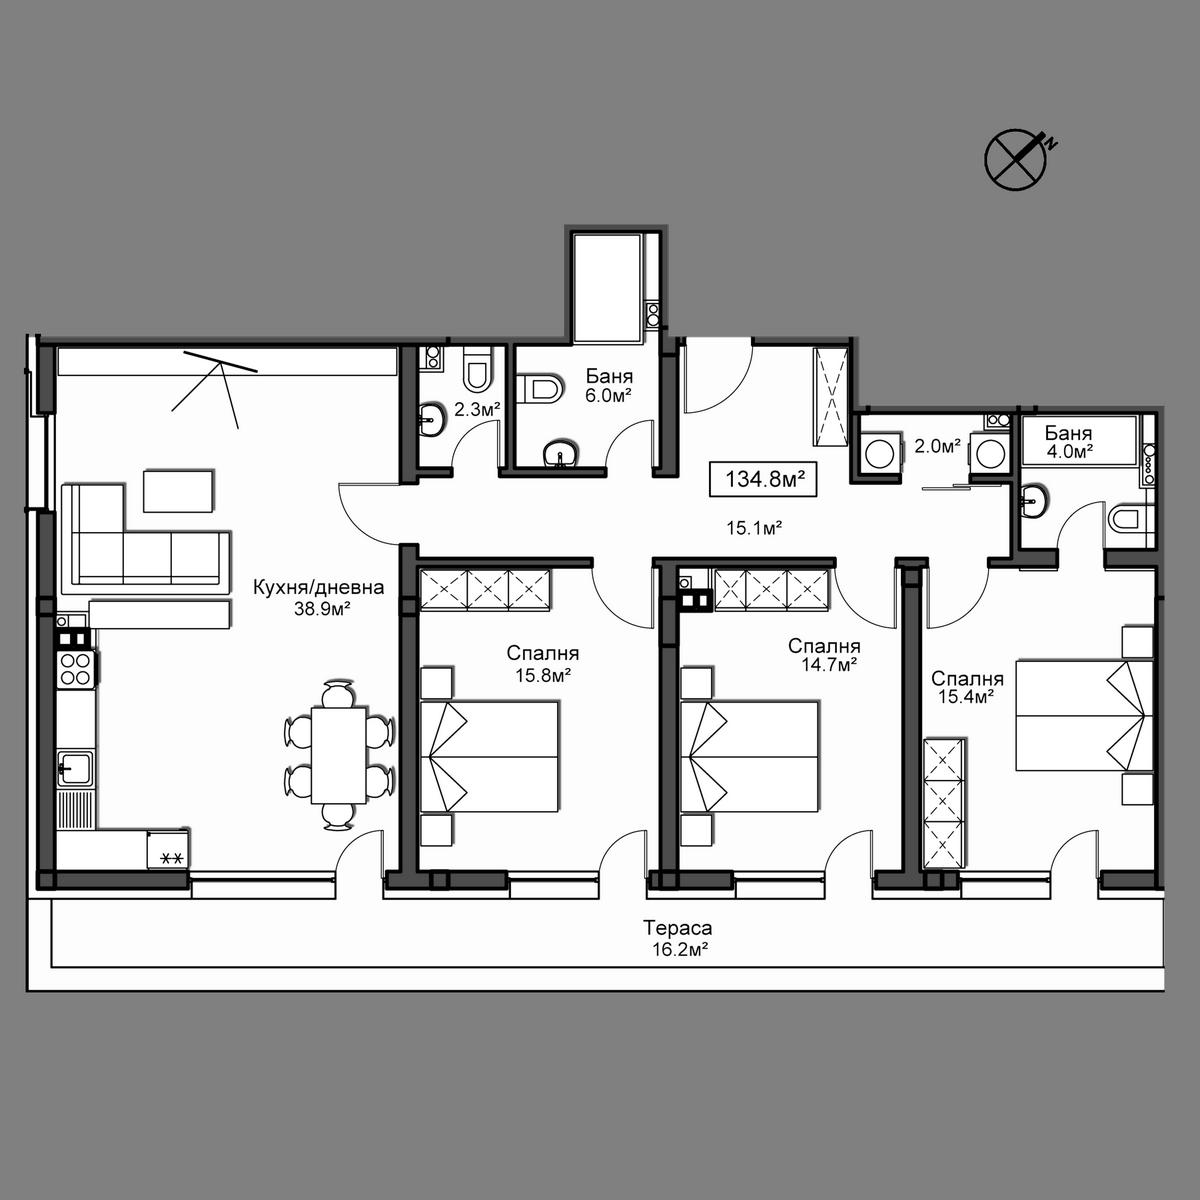 Продава апартамент ново строителство - Апартамент 51